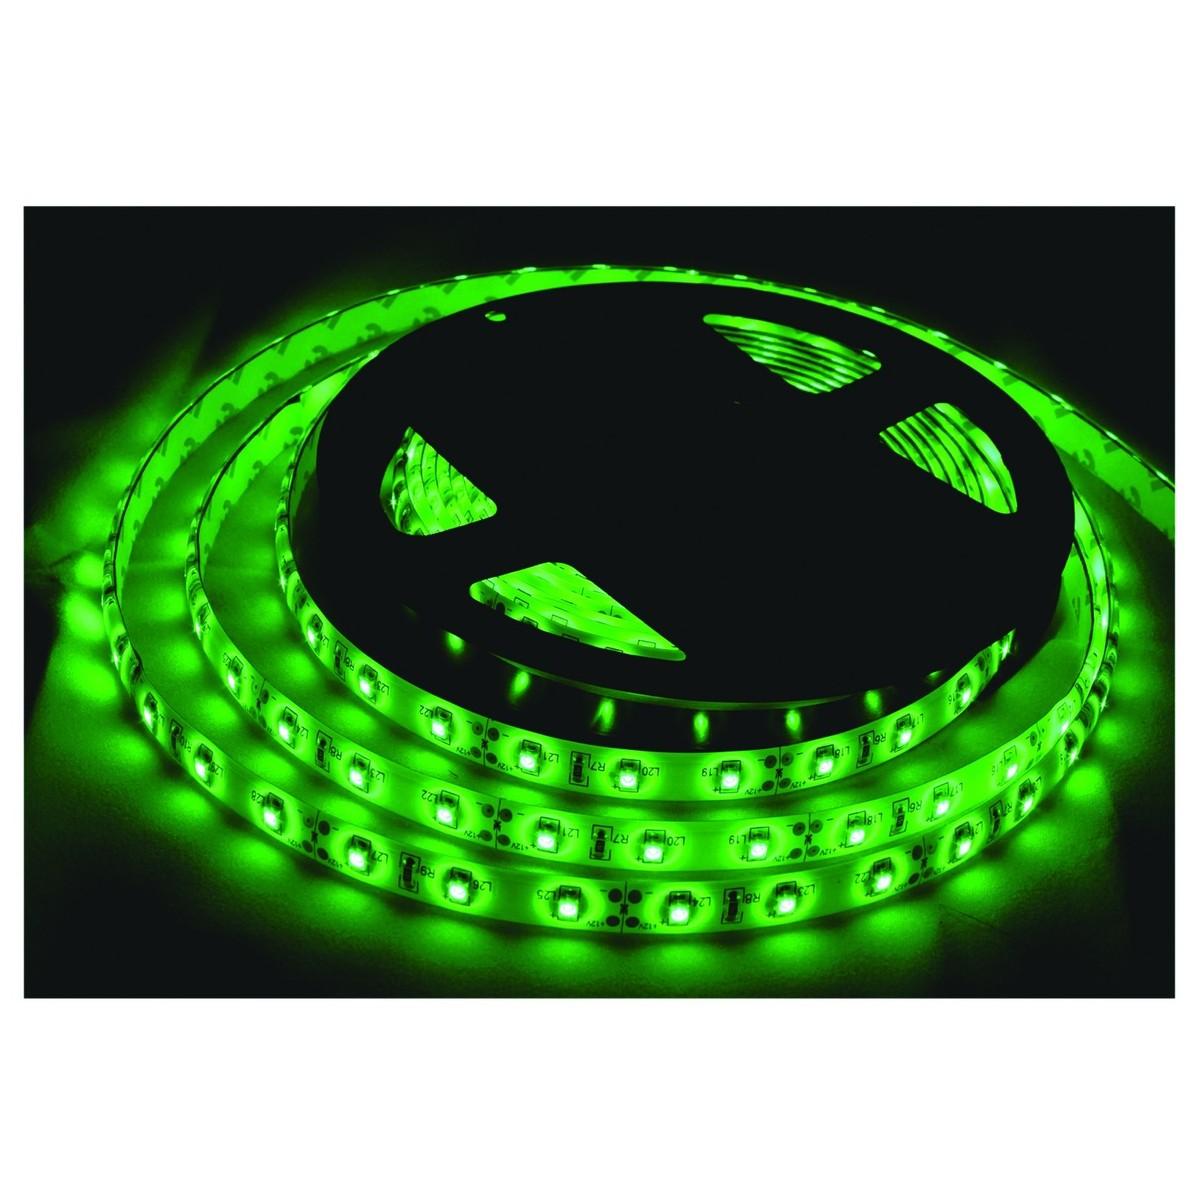 LR Technology LED Tape Light Kit 5M, Green at Gear4music.com